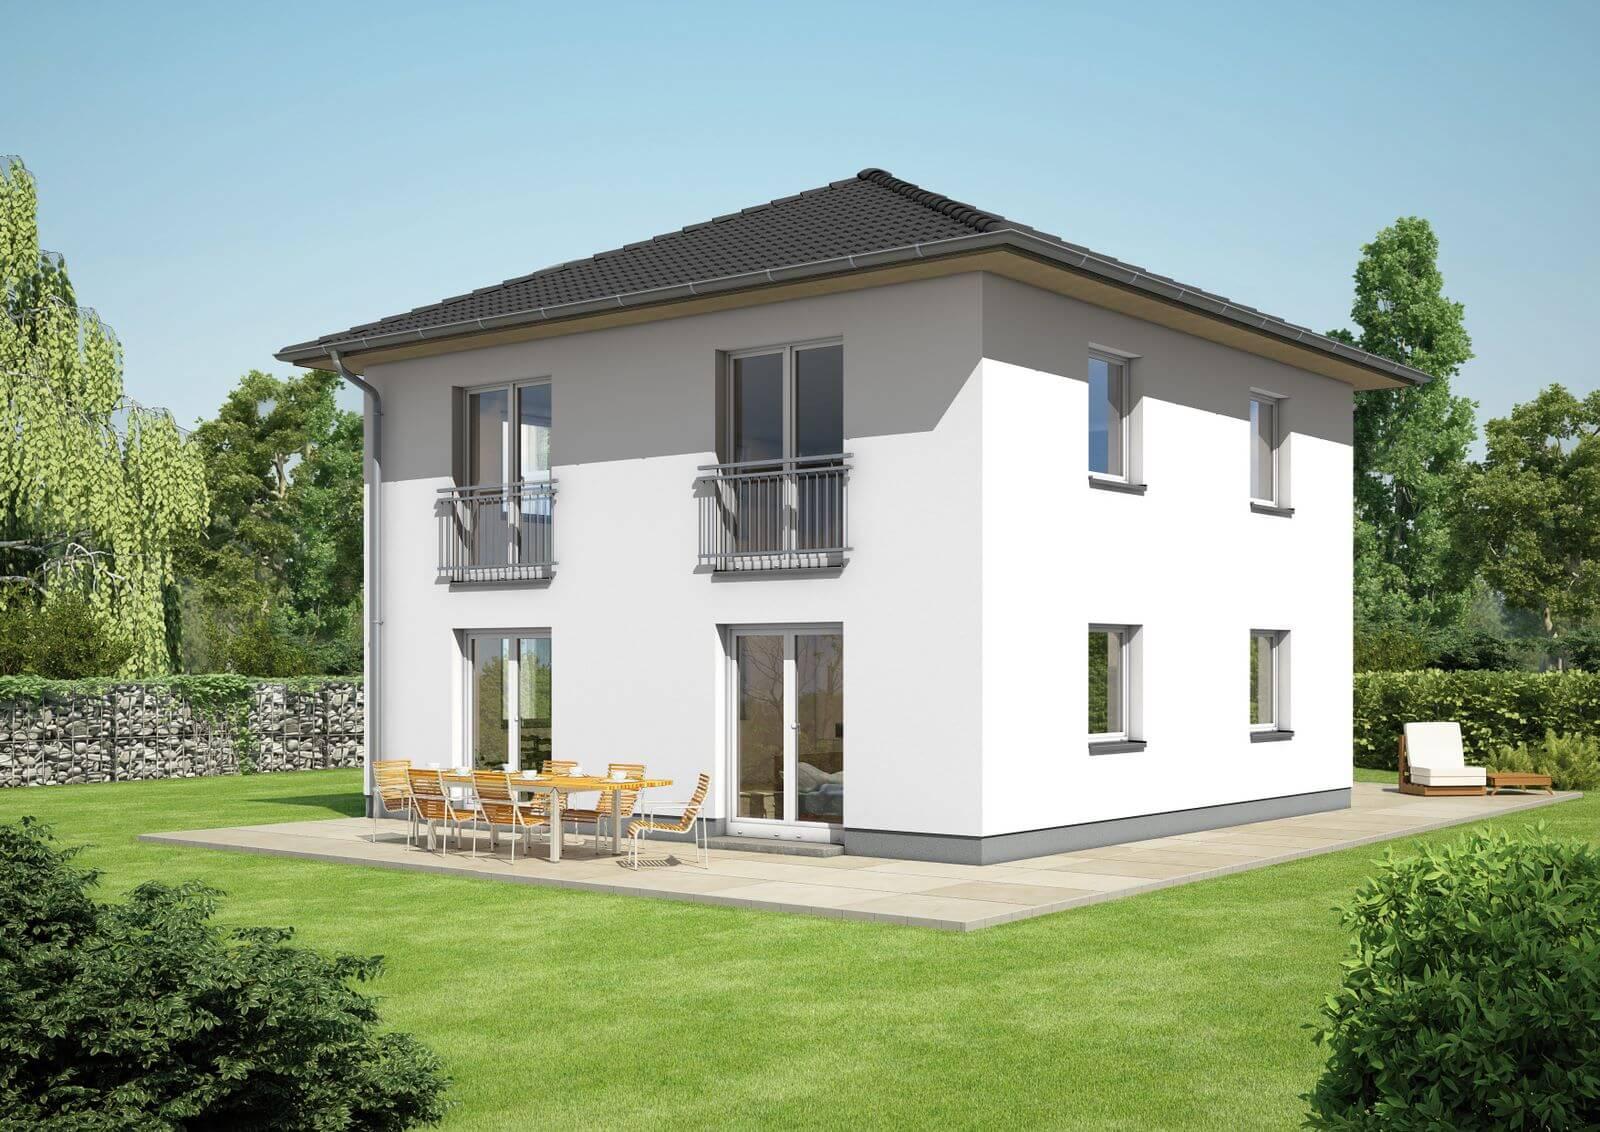 city 167 mit zeltdach individuell planbar energiesparhausplus. Black Bedroom Furniture Sets. Home Design Ideas